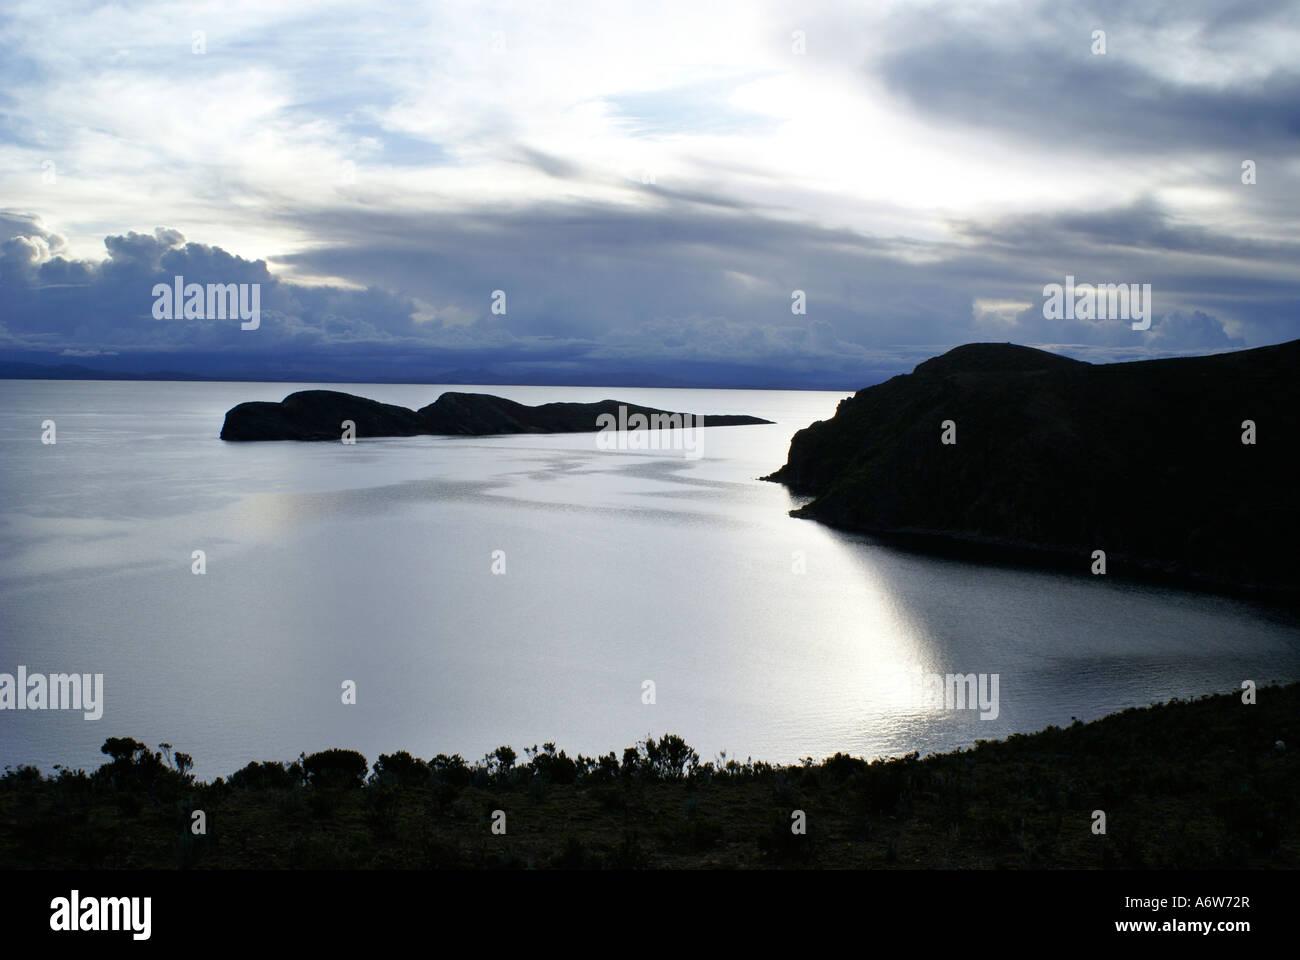 View over the Lake Titikaka in the evening, Isla del Sol, Bolivia - Stock Image